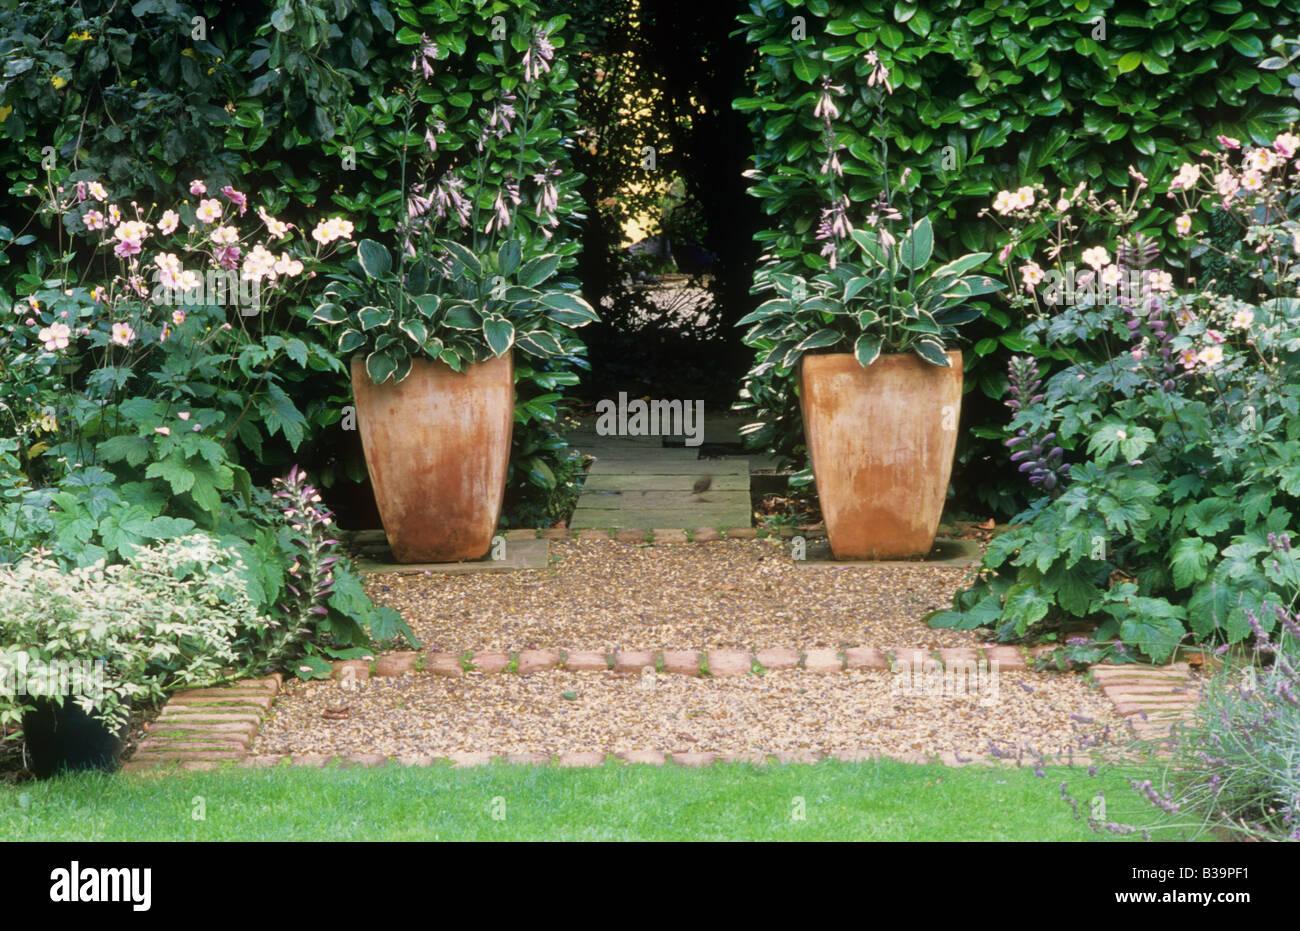 Pair Of Ceramic Terracotta Pots Containers Planters Hosta Gravel Brick Path  Laurel Hedge Small Garden Design Lawn Anemone Flower